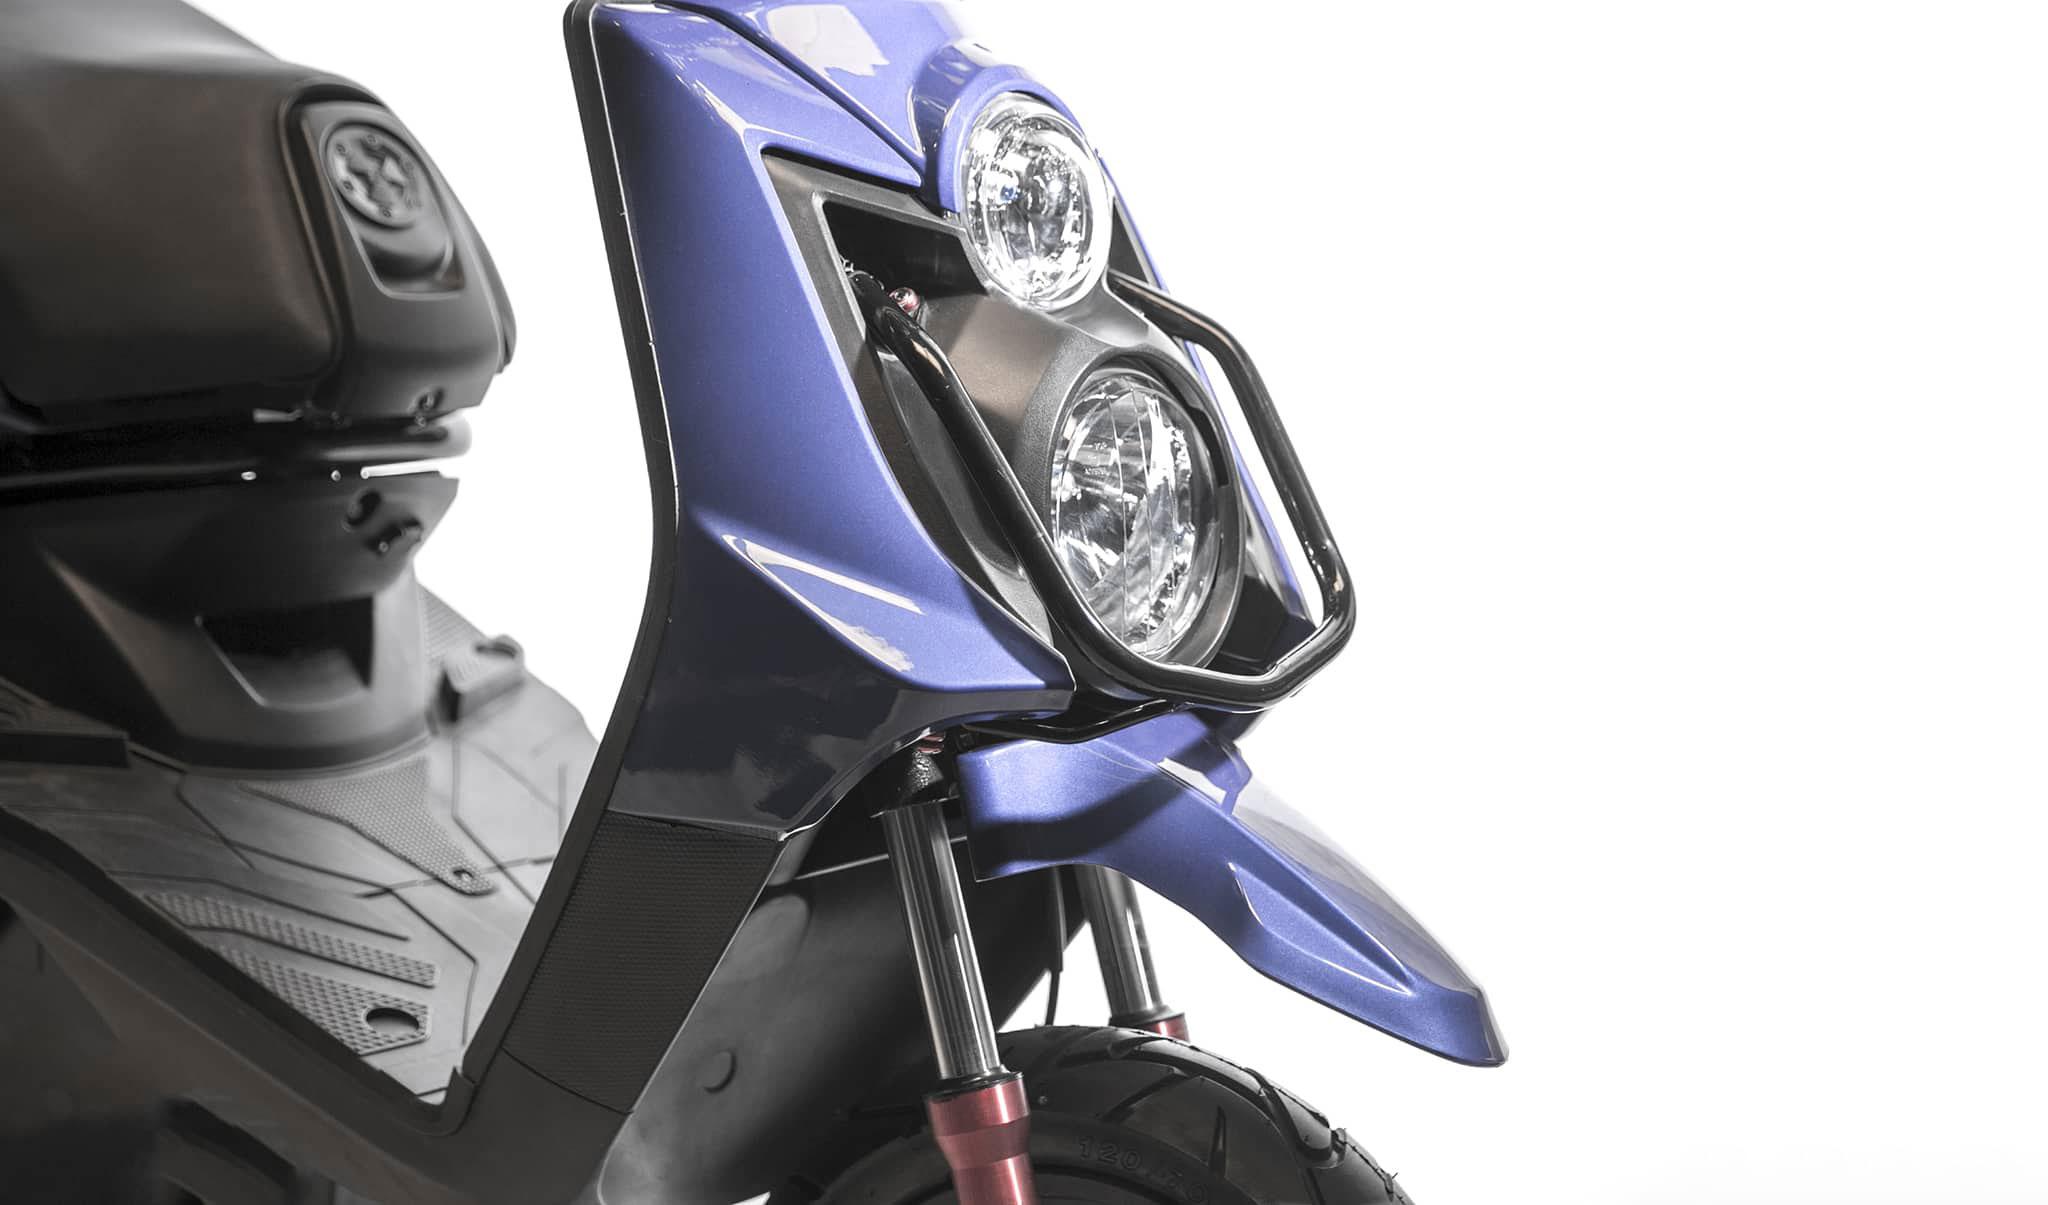 موتور سیکلت برقی RL5